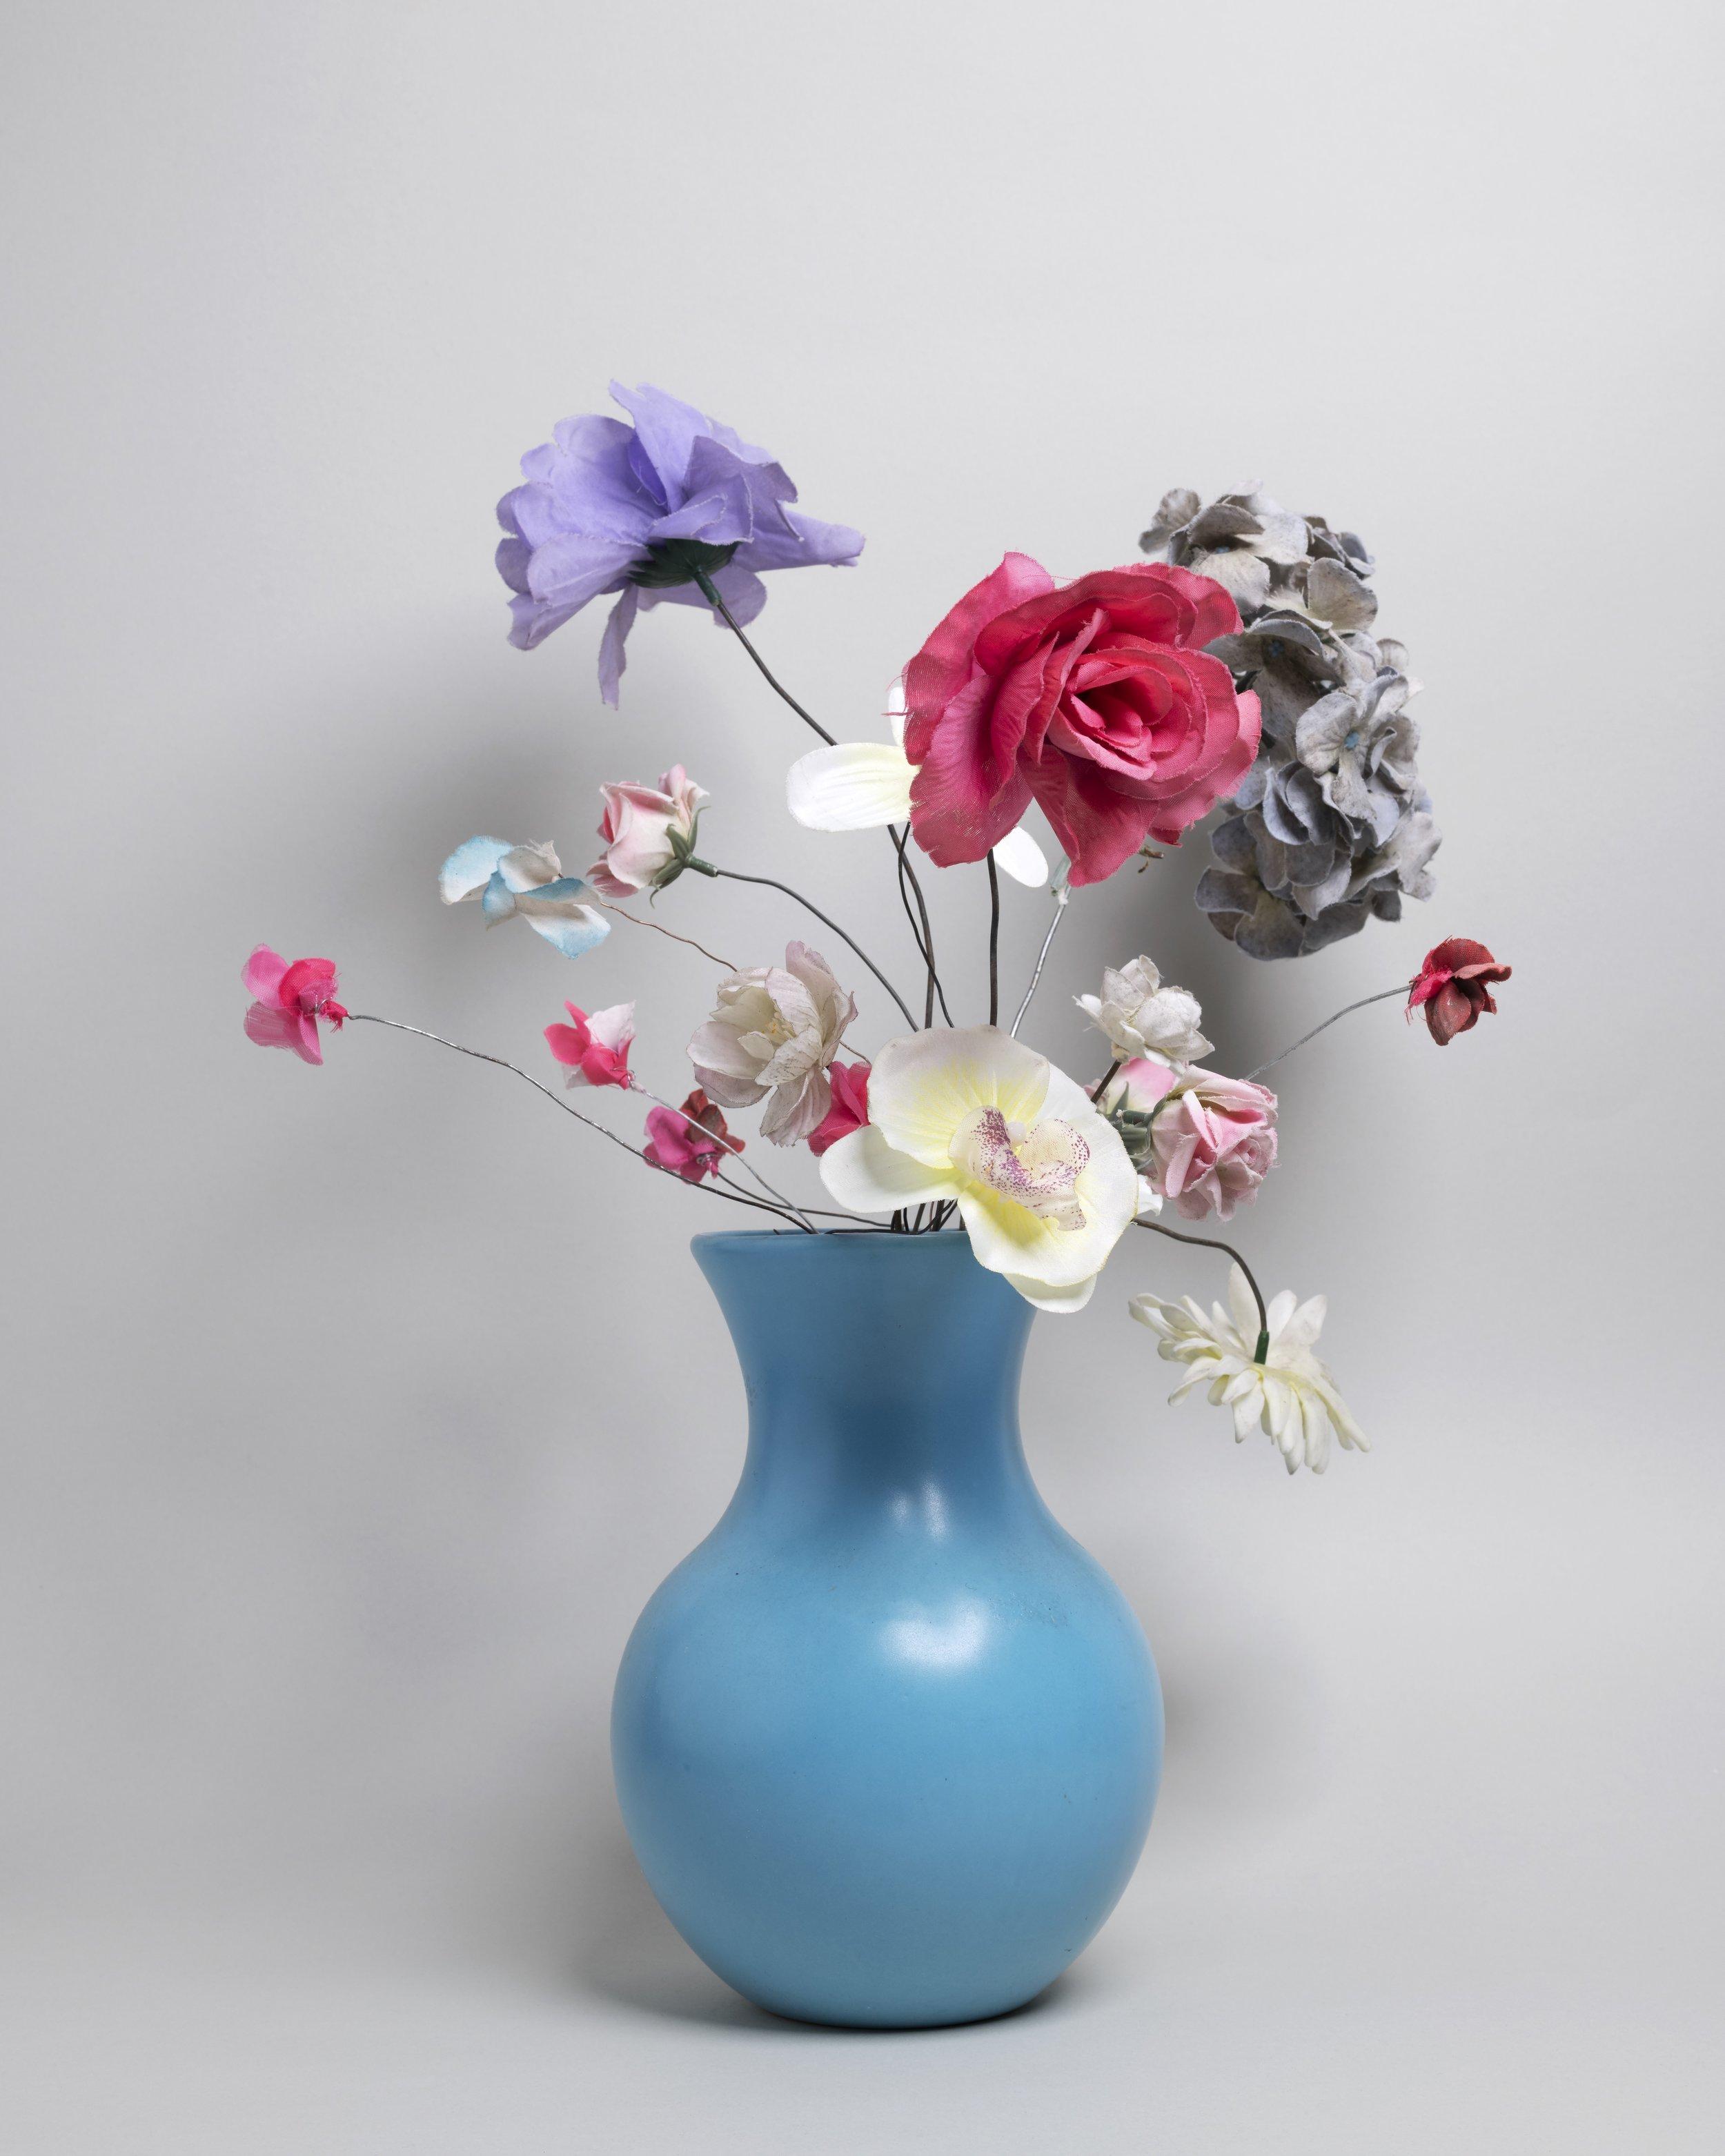 Urban jungle (city flora), blauwe vaas, 2019, editie 5 + 1 A.P. originele fotoafdruk acrylglas 40x50cm - fotografie i.s.m. Jeroen Arians.jpg